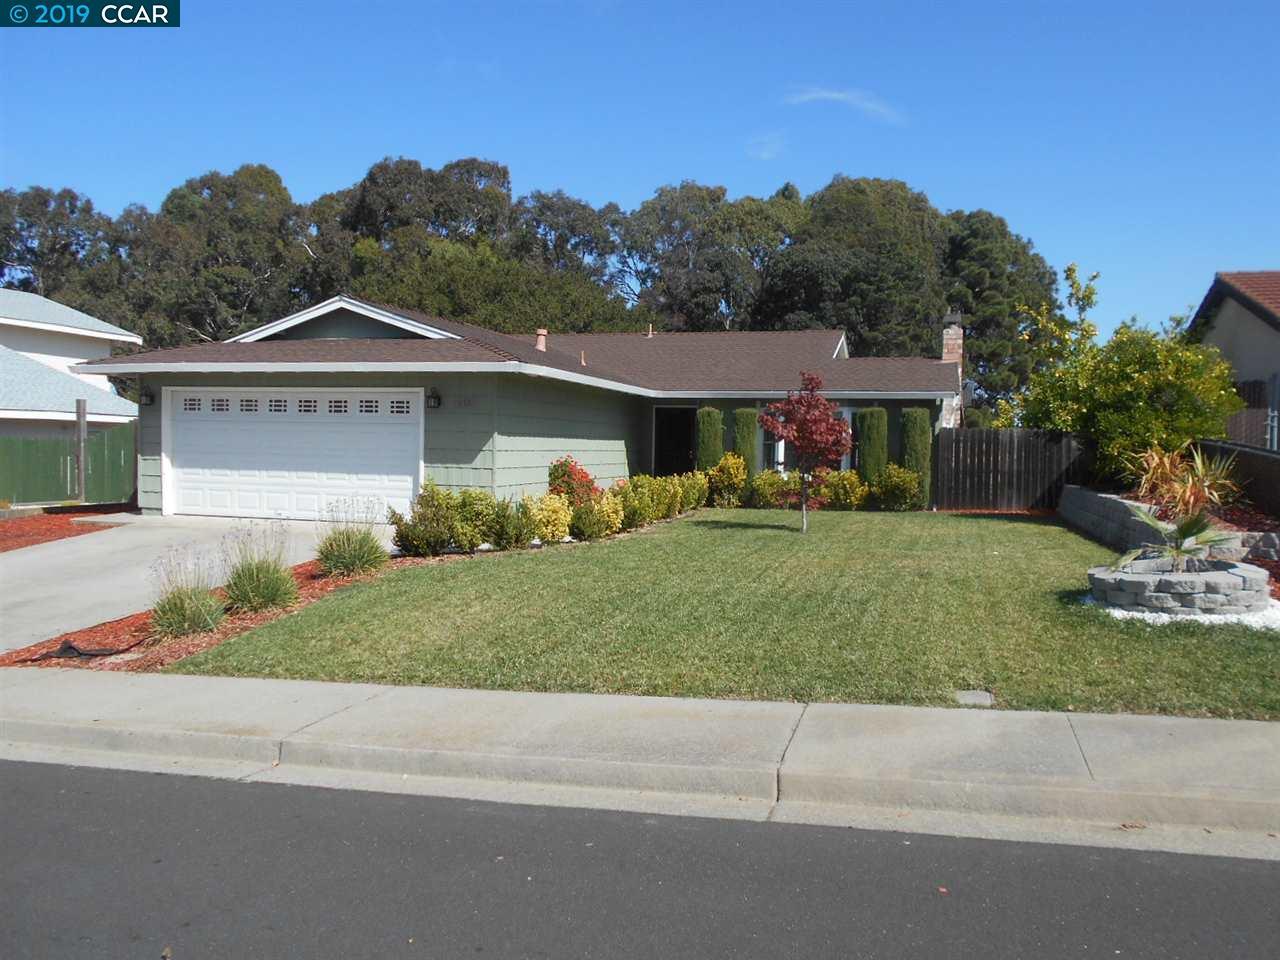 1067 CALIFORNIA ST, RODEO, CA 94572